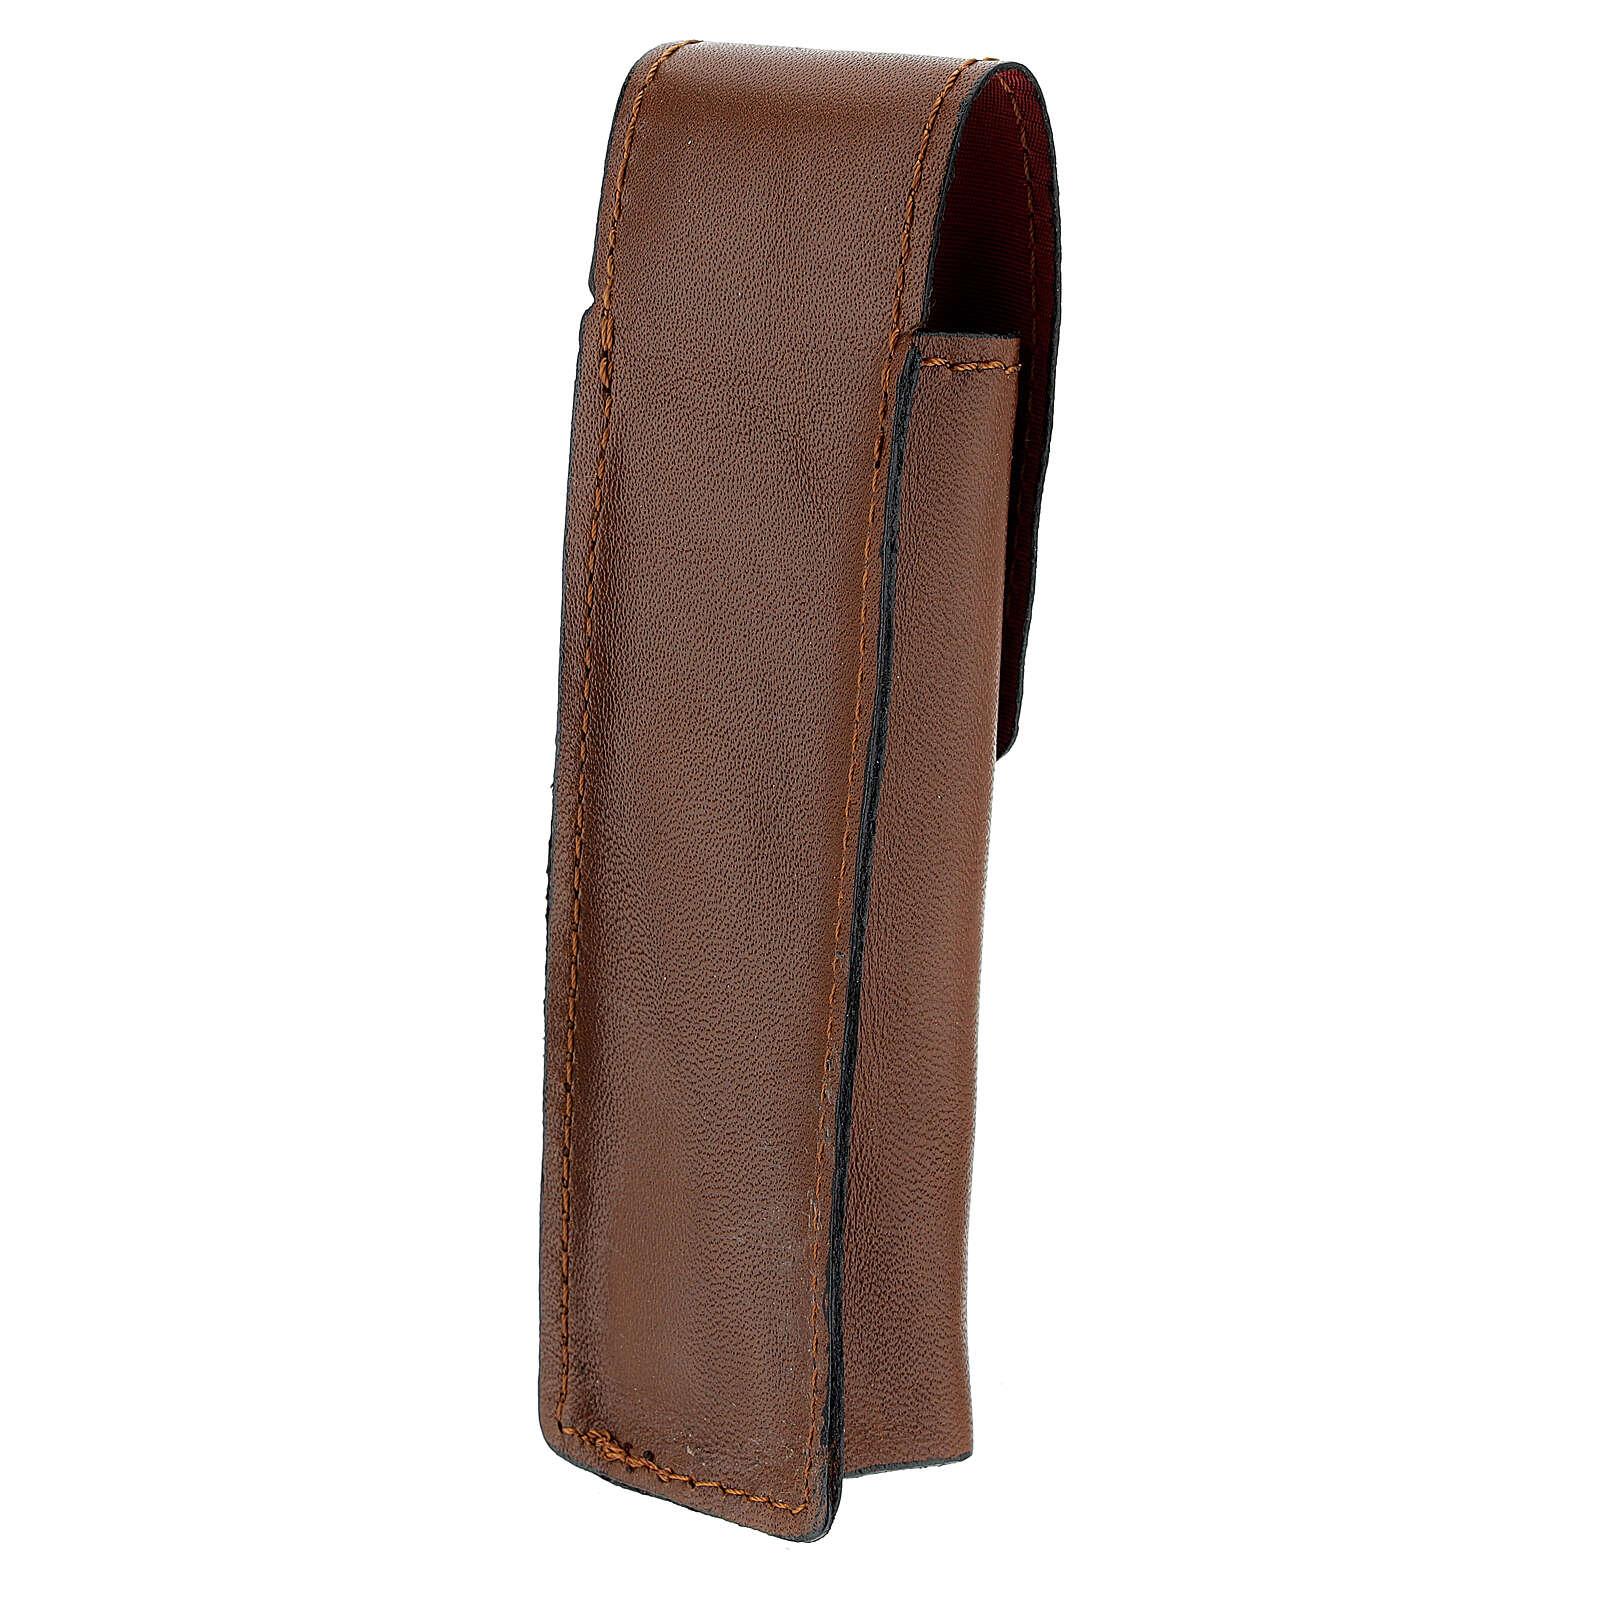 Sprinkler case 5 in real brown leather 3